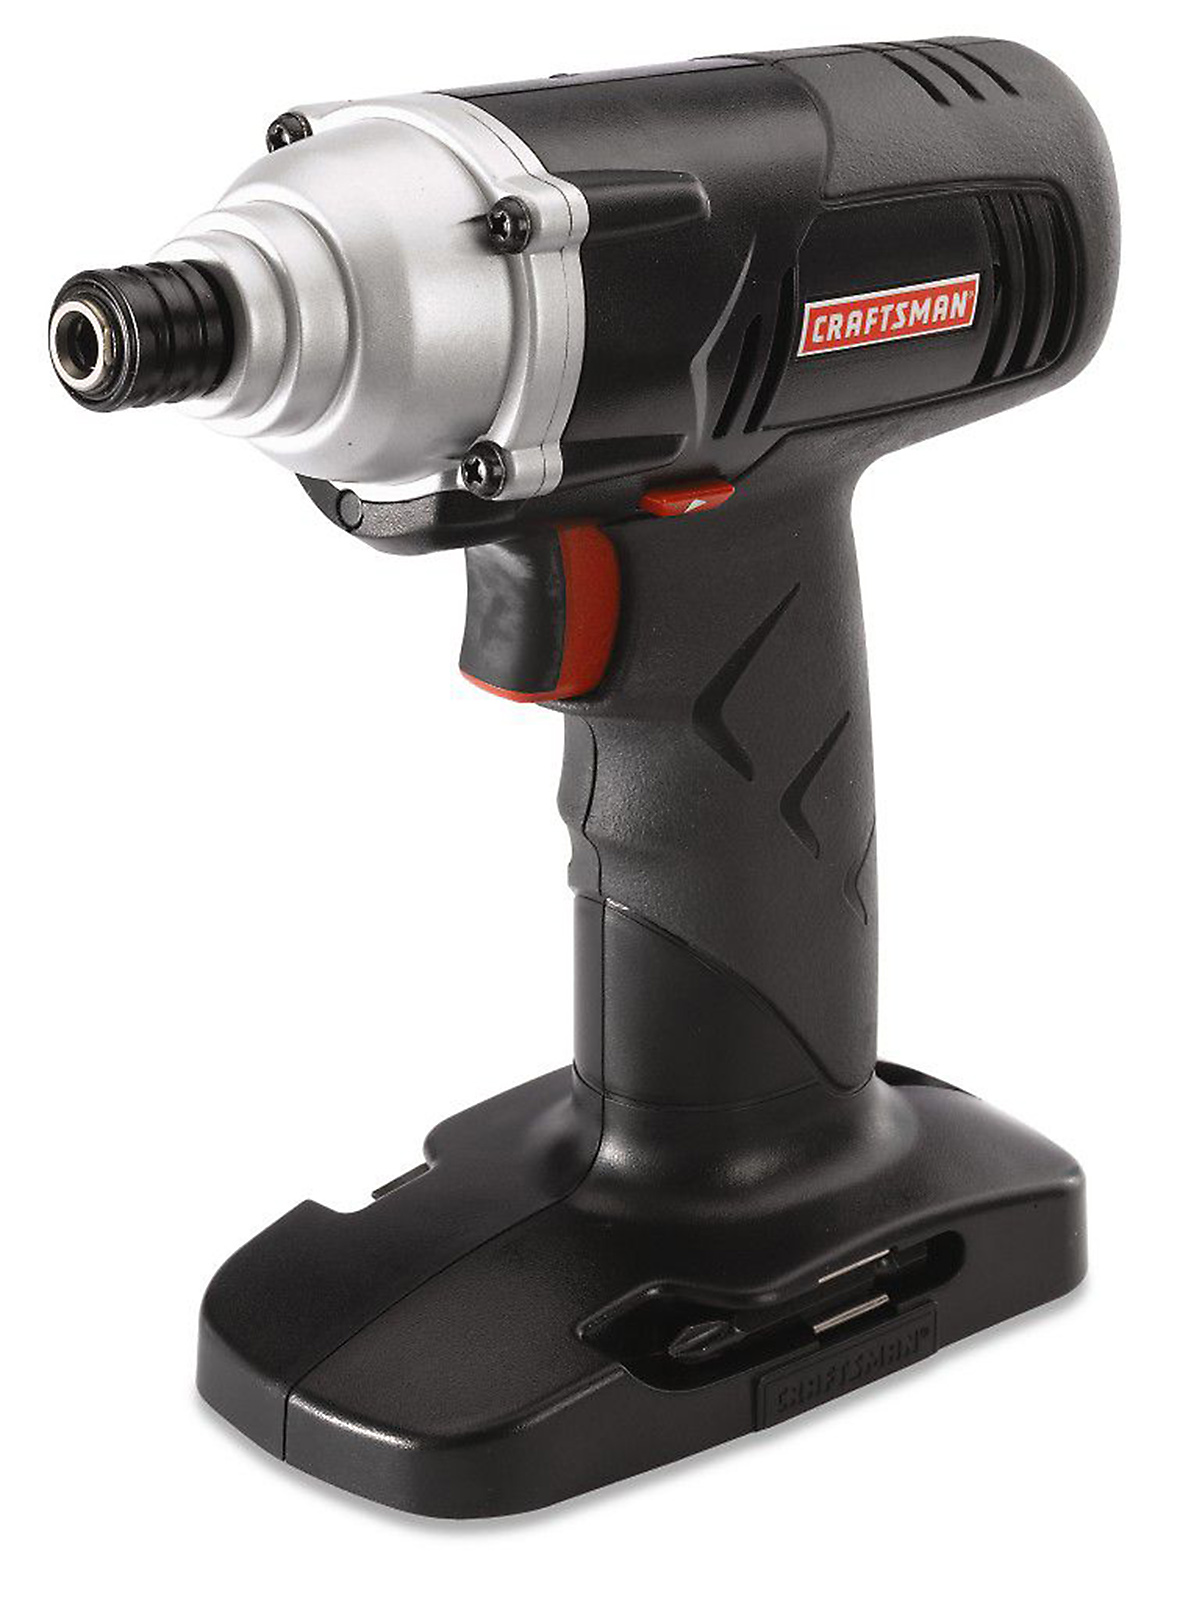 Craftsman Professional Use 19.2 Volt 5 pc. C3 Combo Kit